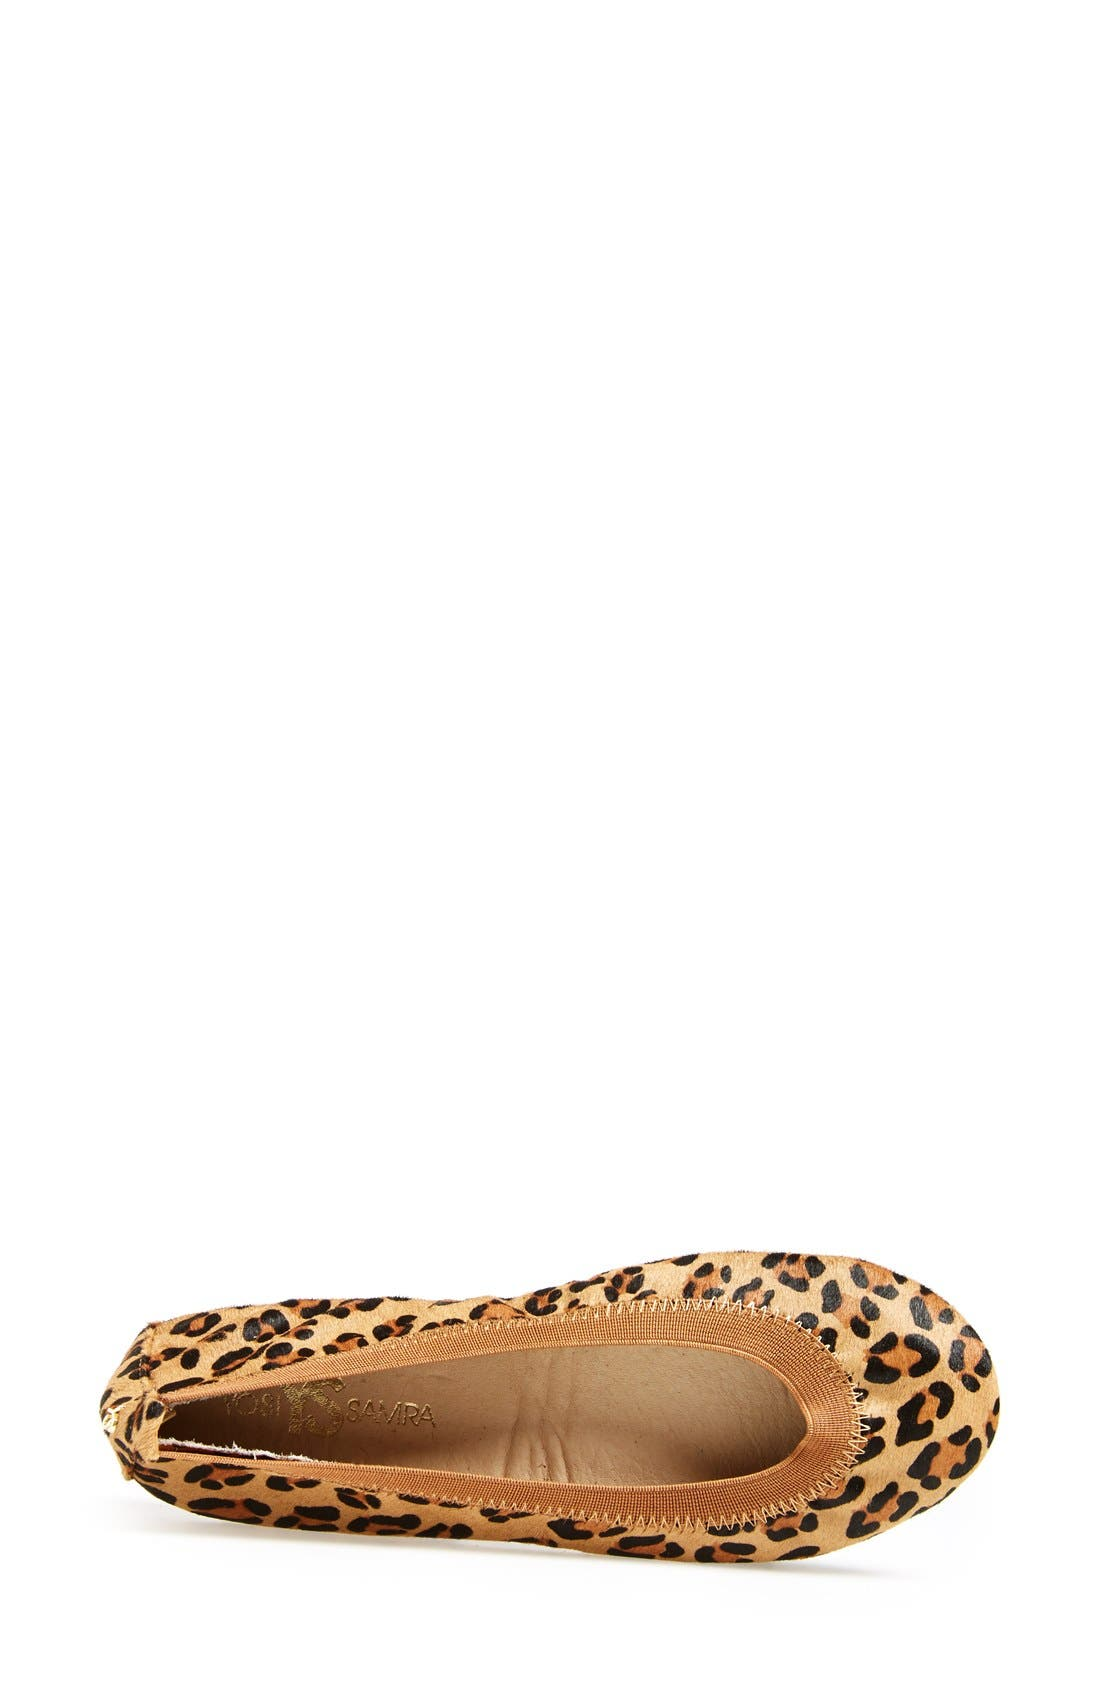 'Samara' Genuine Calf Hair Foldable Ballet Flat,                             Alternate thumbnail 3, color,                             Leopard